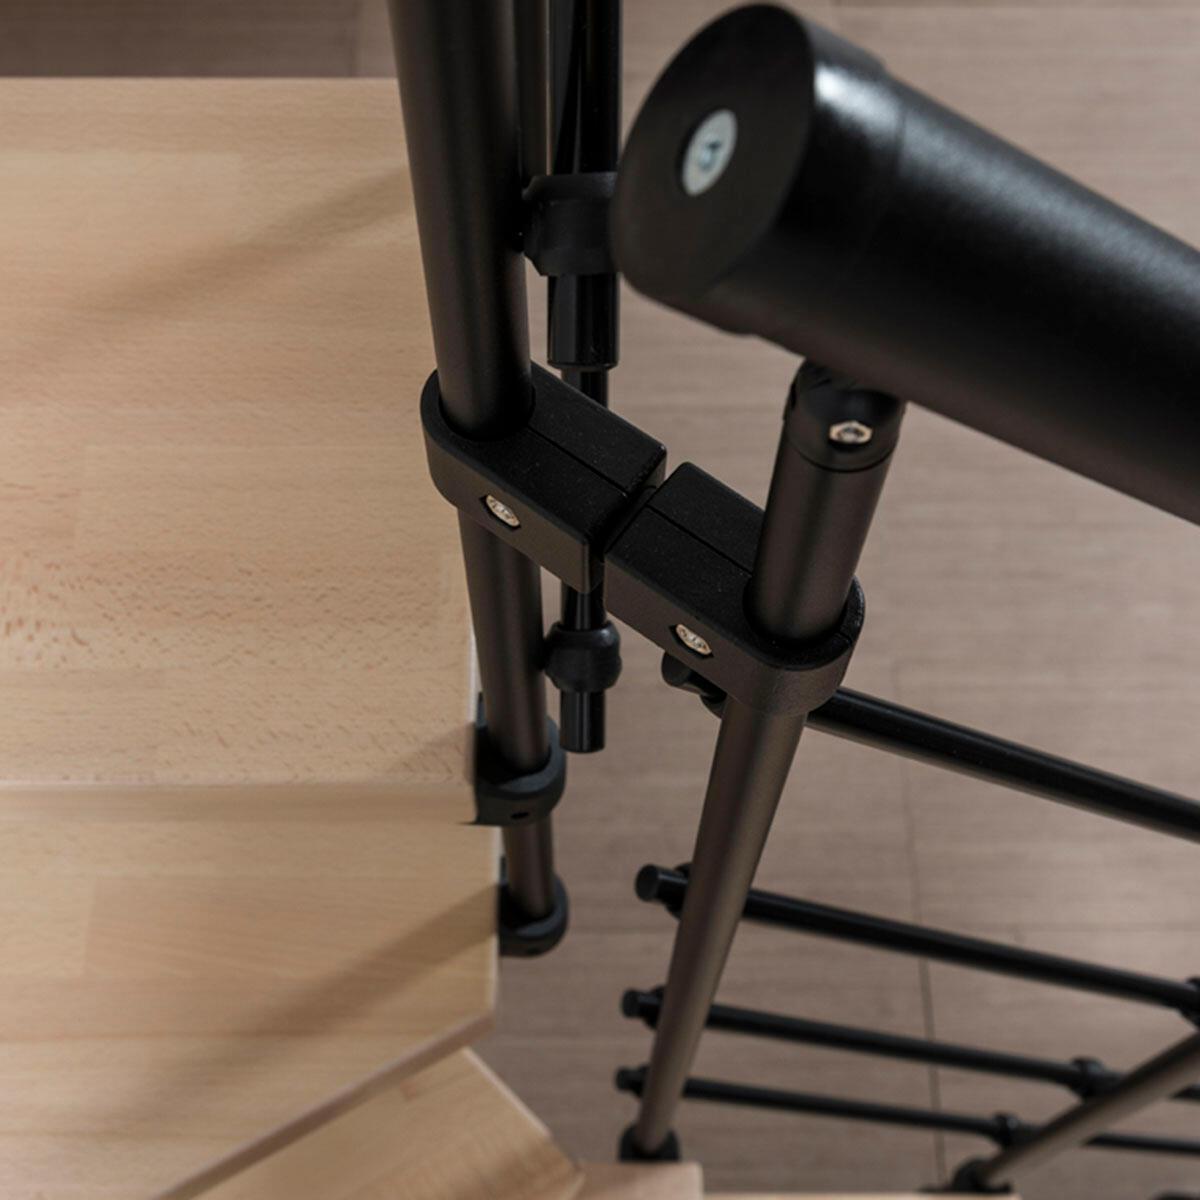 Scala a rampa 1/4 di giro Mas 050 PVC FONTANOT L 75 cm, gradino naturale, struttura nero - 6